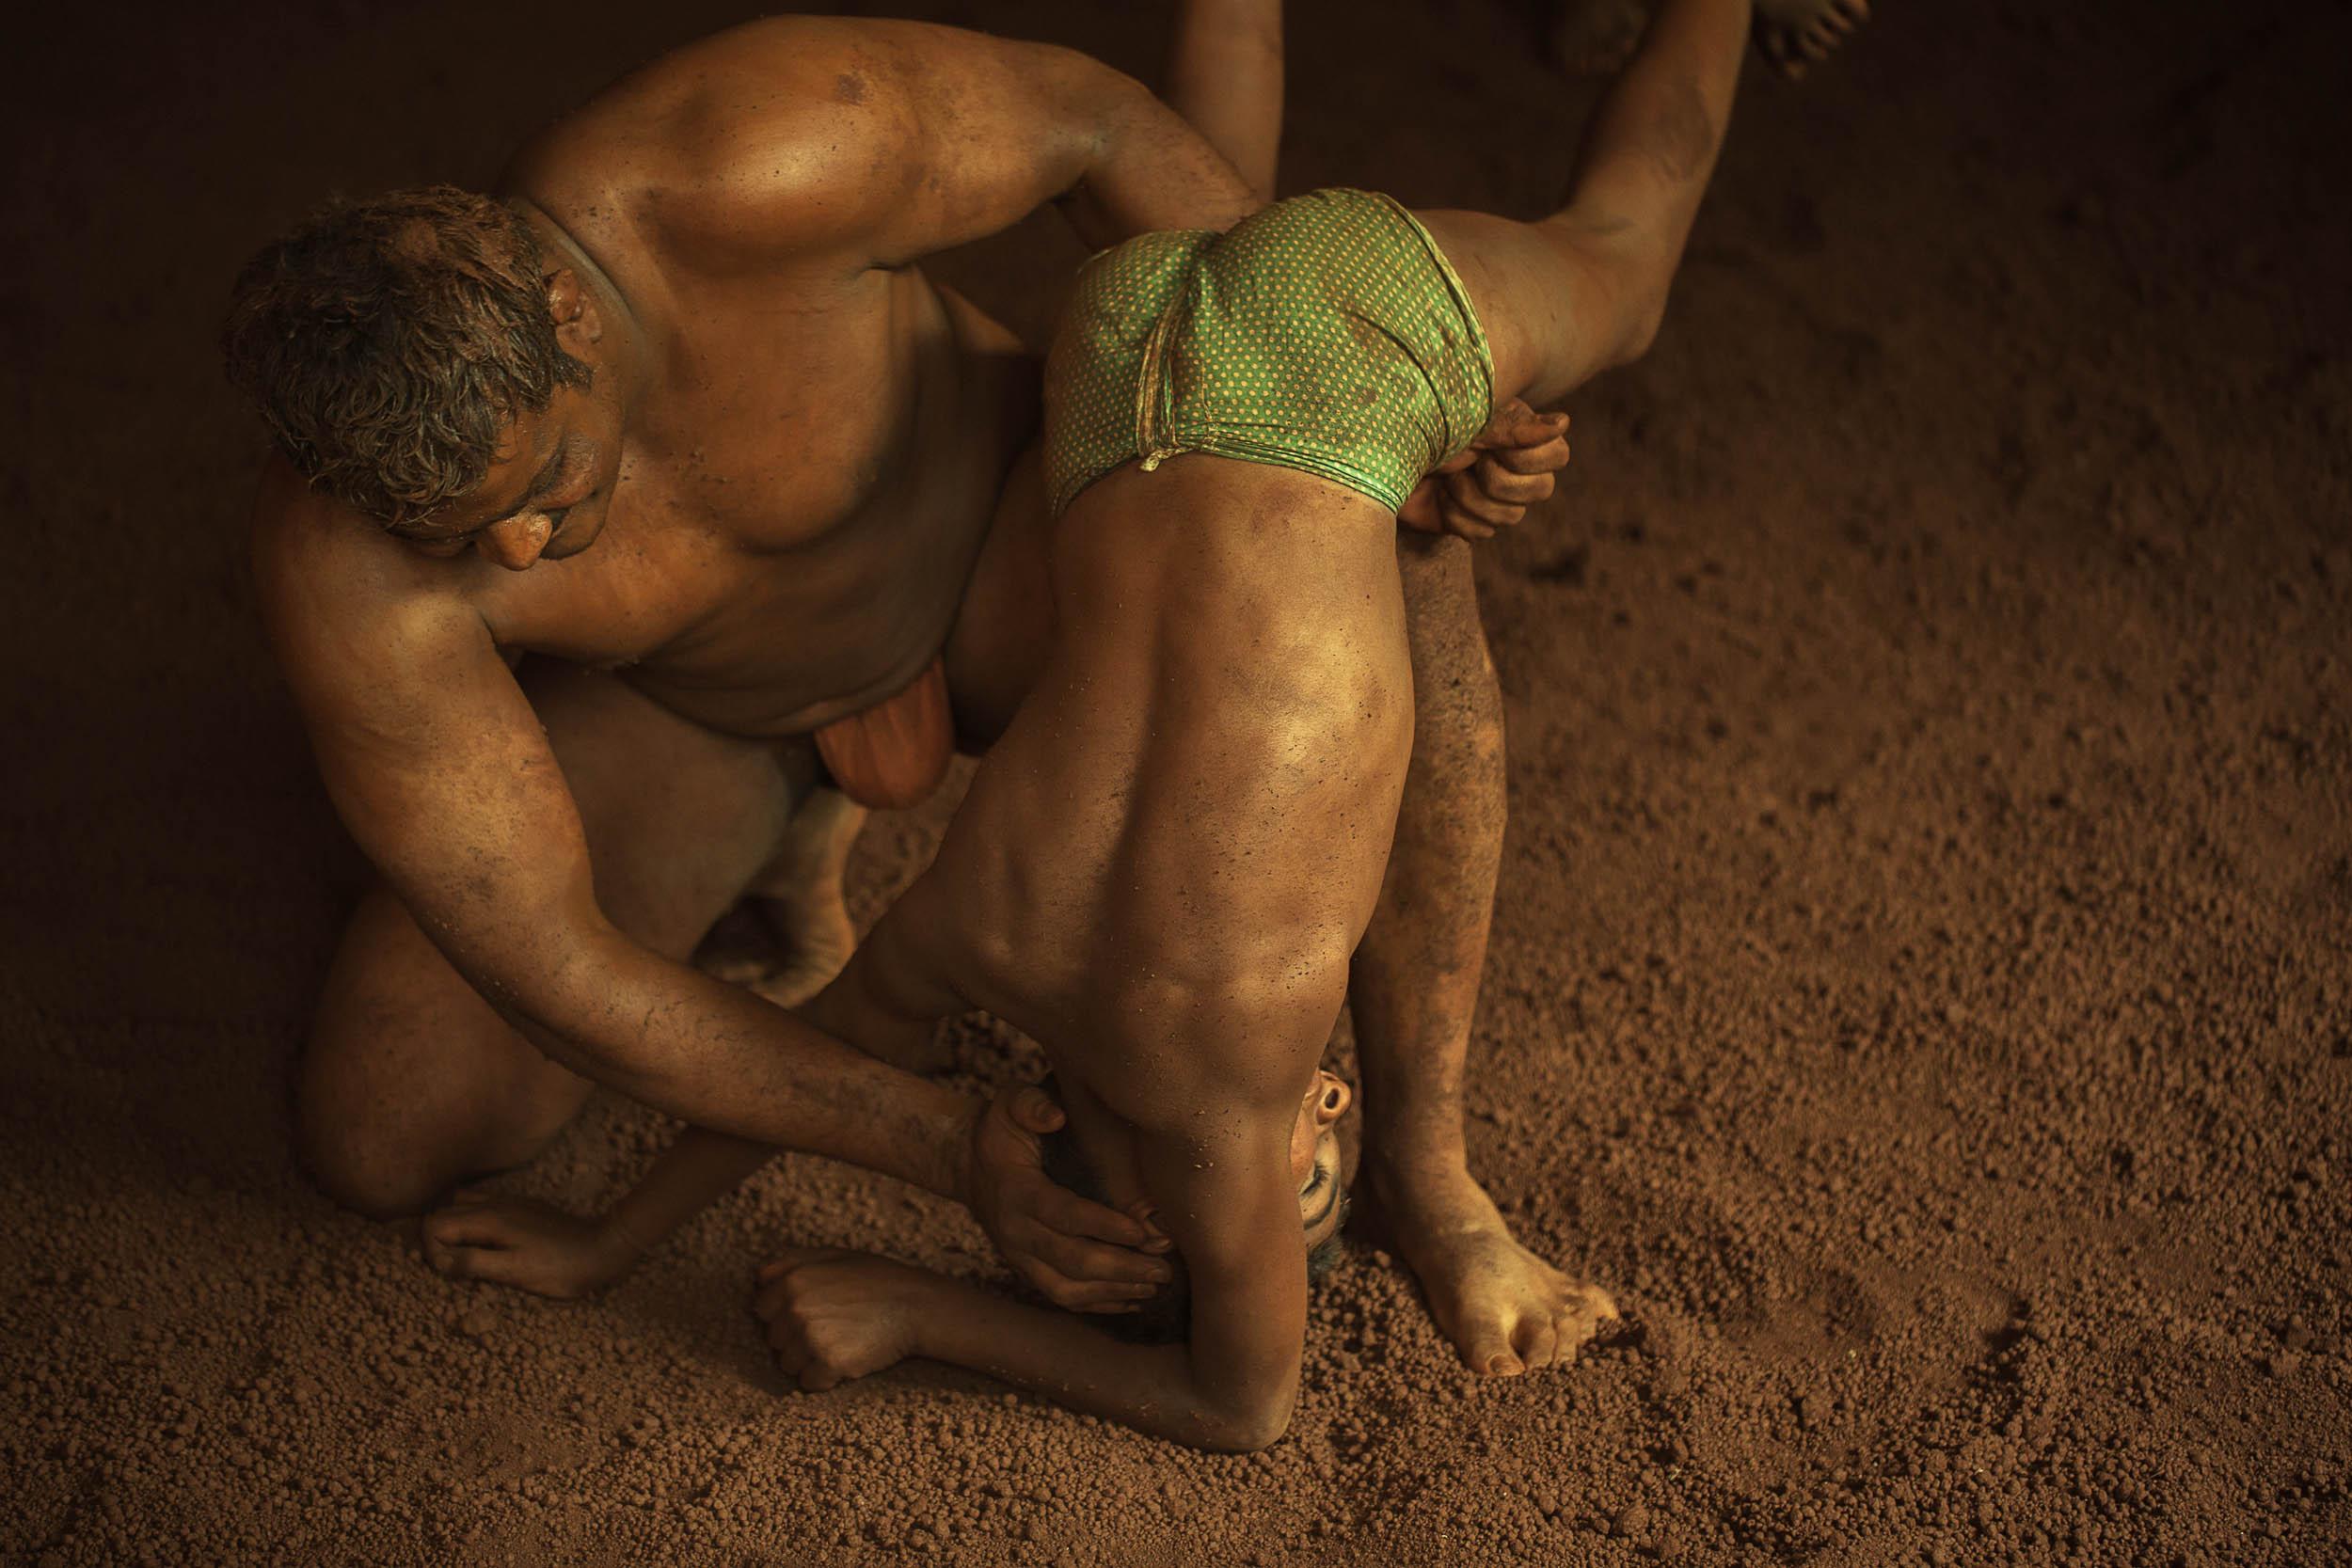 Sindhur_Photography_Travel_People_Wrestlers-32.JPG